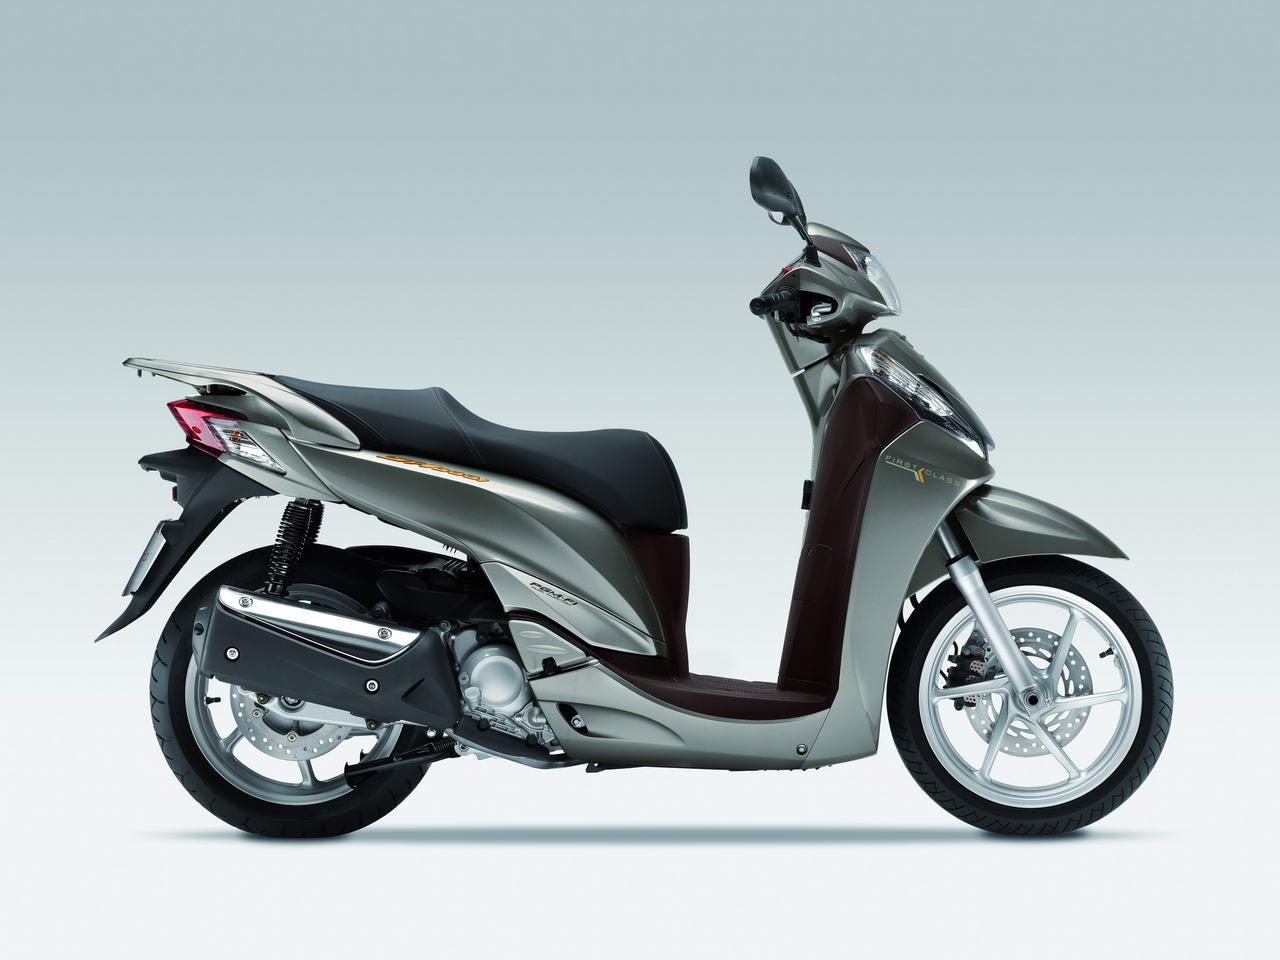 Listino Honda Crosstourer ABS DCT Granturismo on-off - image 14717_honda-sh300isporty-abs on http://moto.motori.net